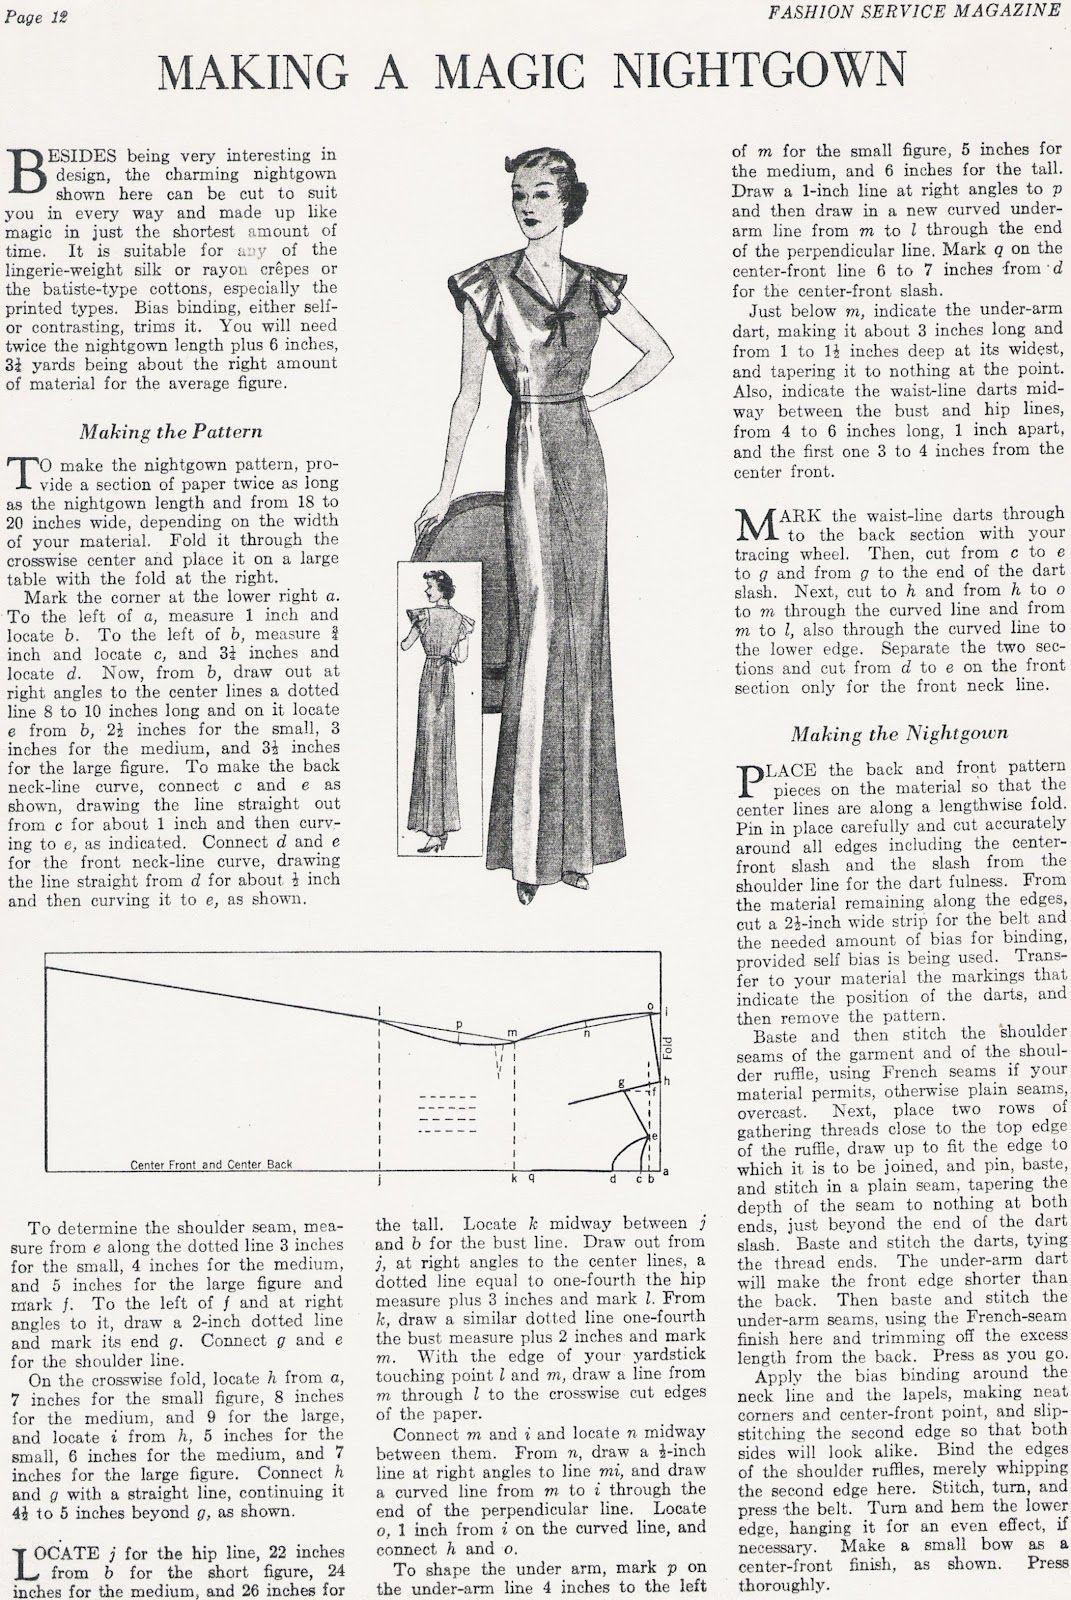 Sewing Vintage | Schnitte | Pinterest | Patrones, Costura y Molde